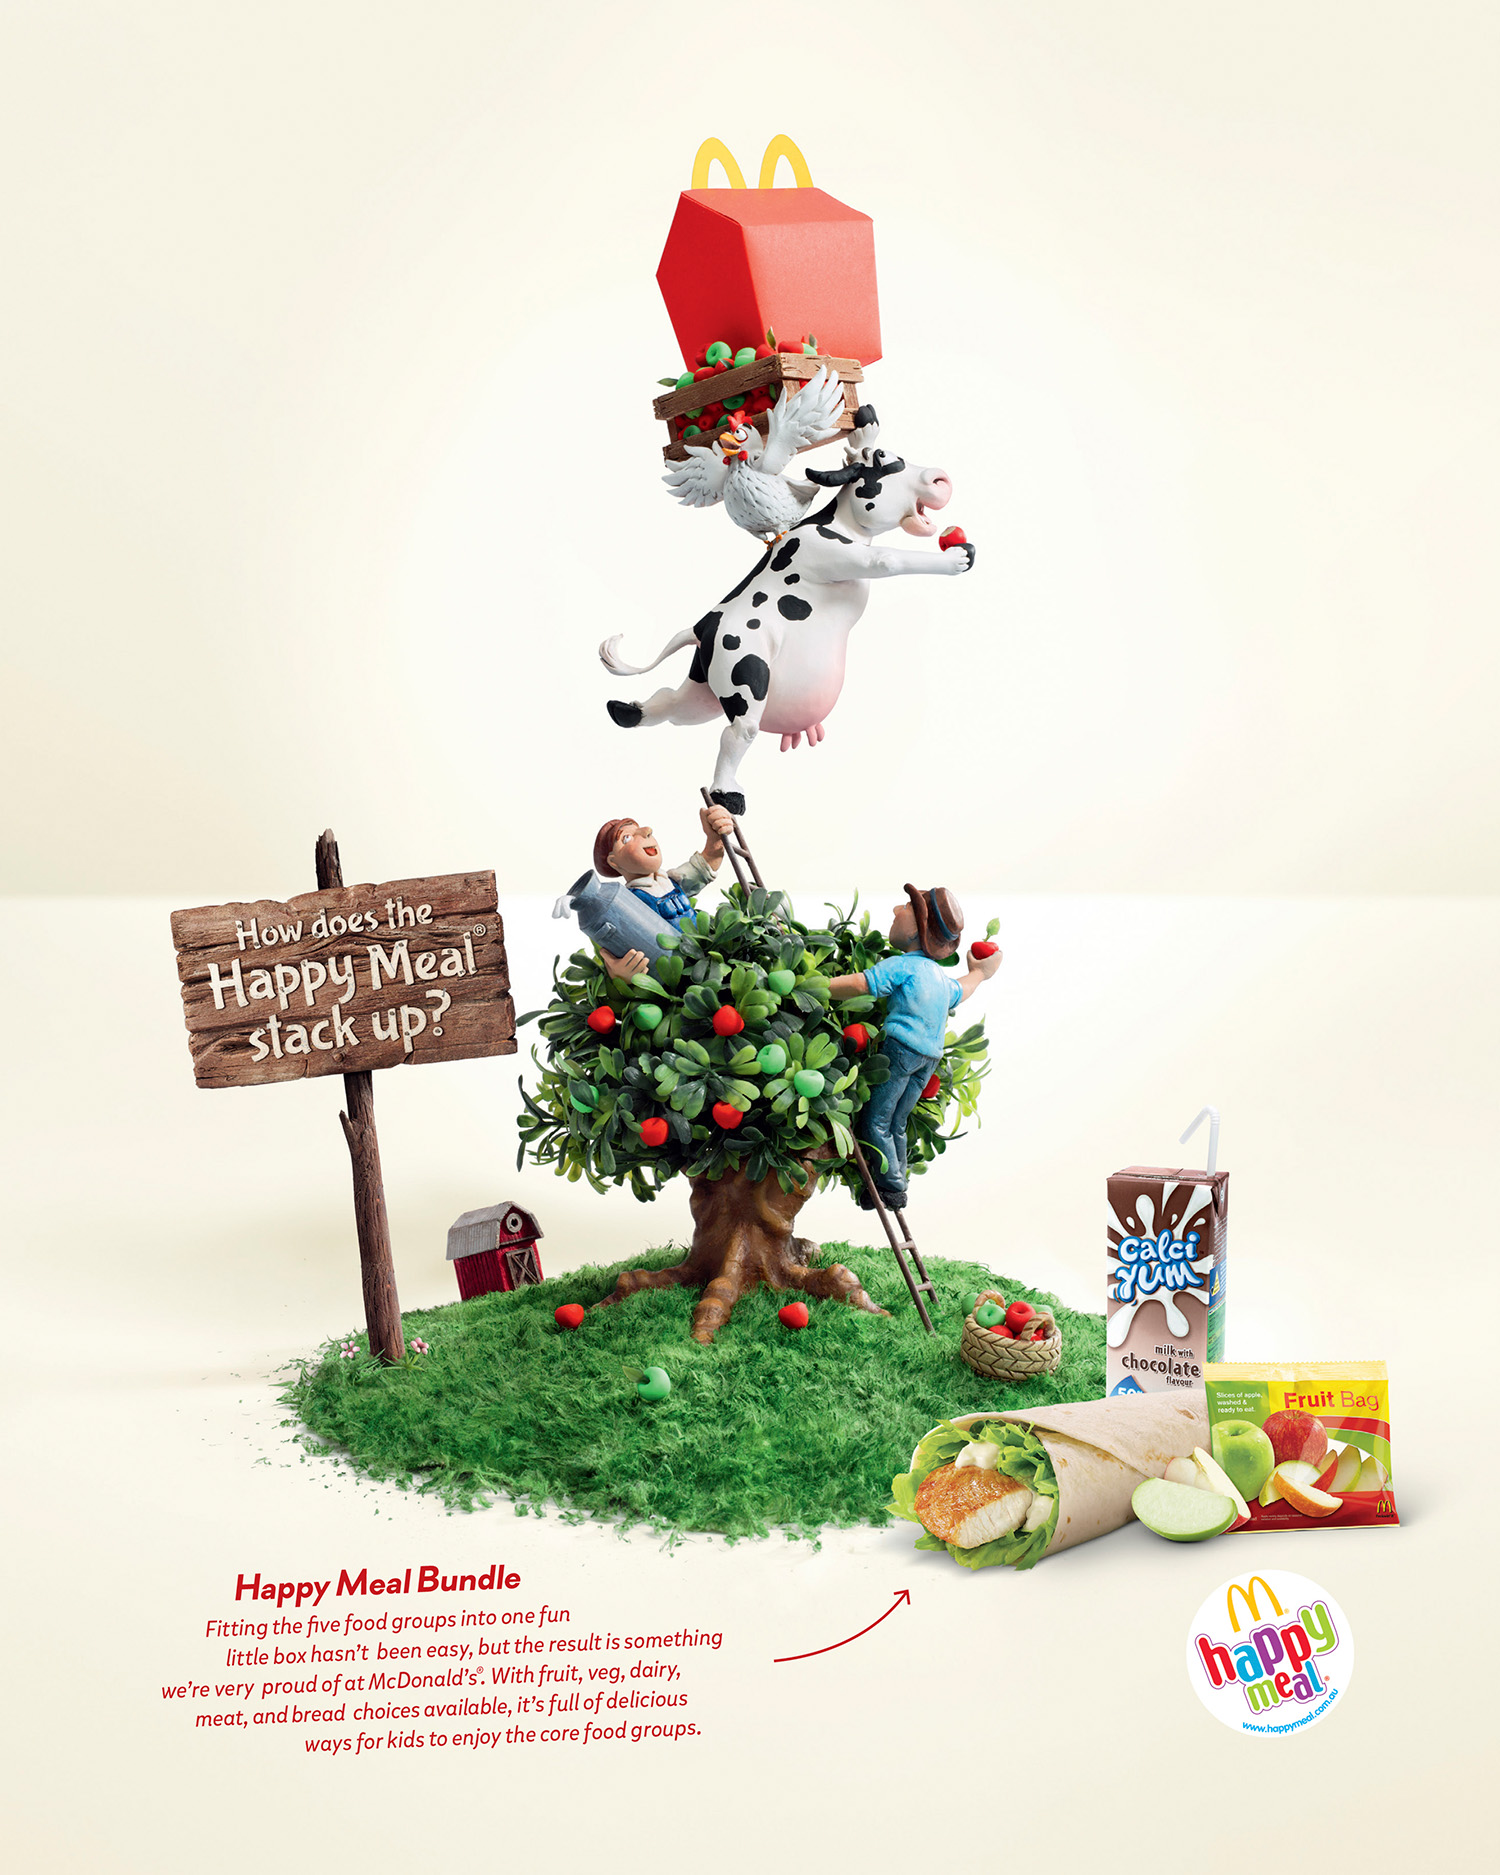 McDonalds  Agency:Leo Burnett  Art Director: Brendan Donnelly  Copywriter: Guy Futcher  Retouching: Electric Art